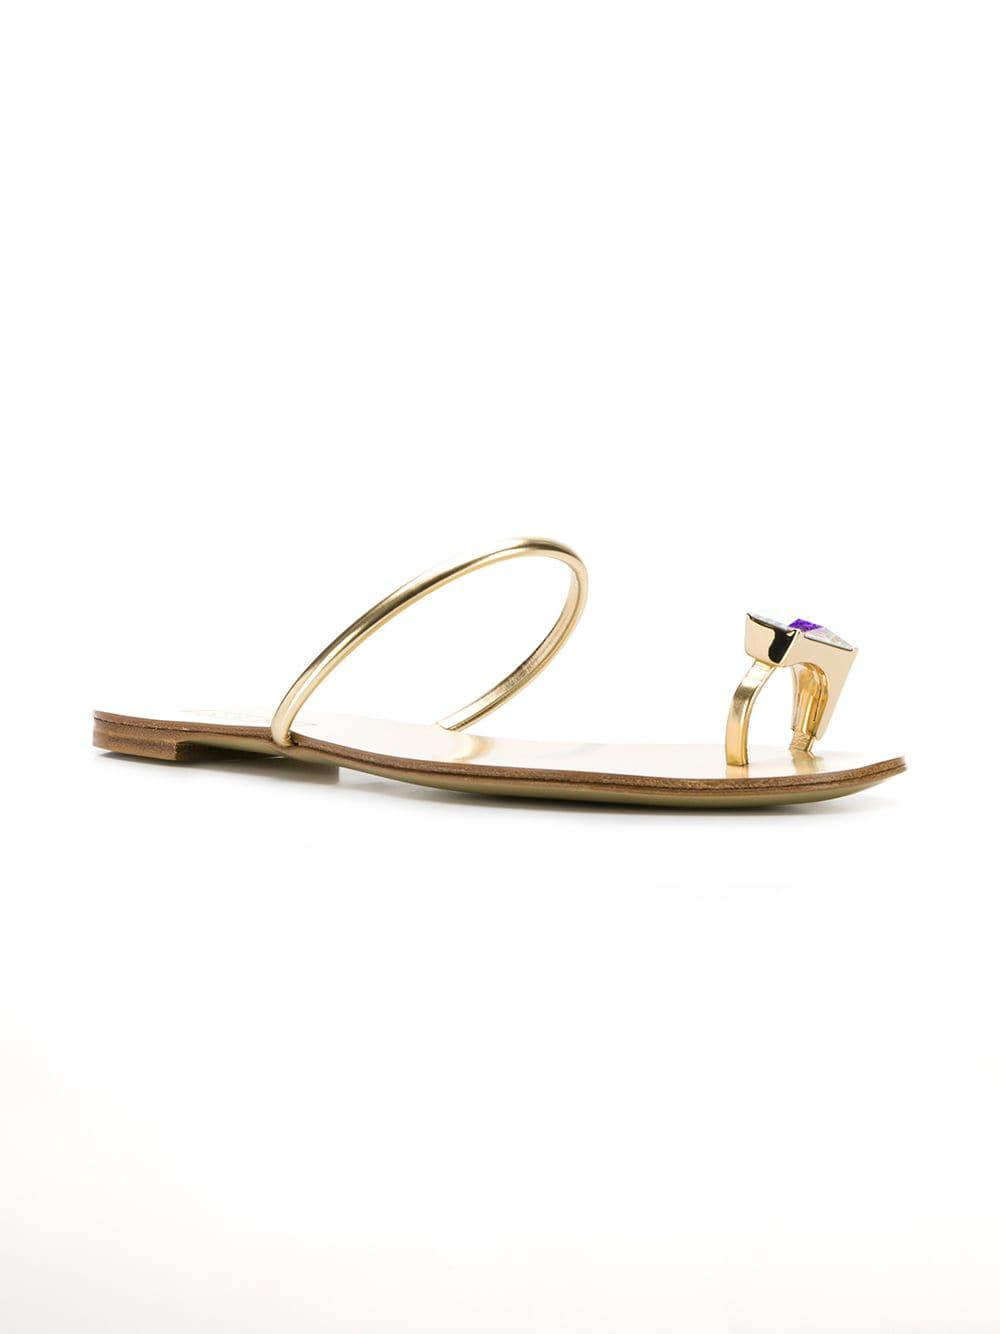 06ce1feec366 Lyst - Casadei Crystal Toe Sandals in Metallic